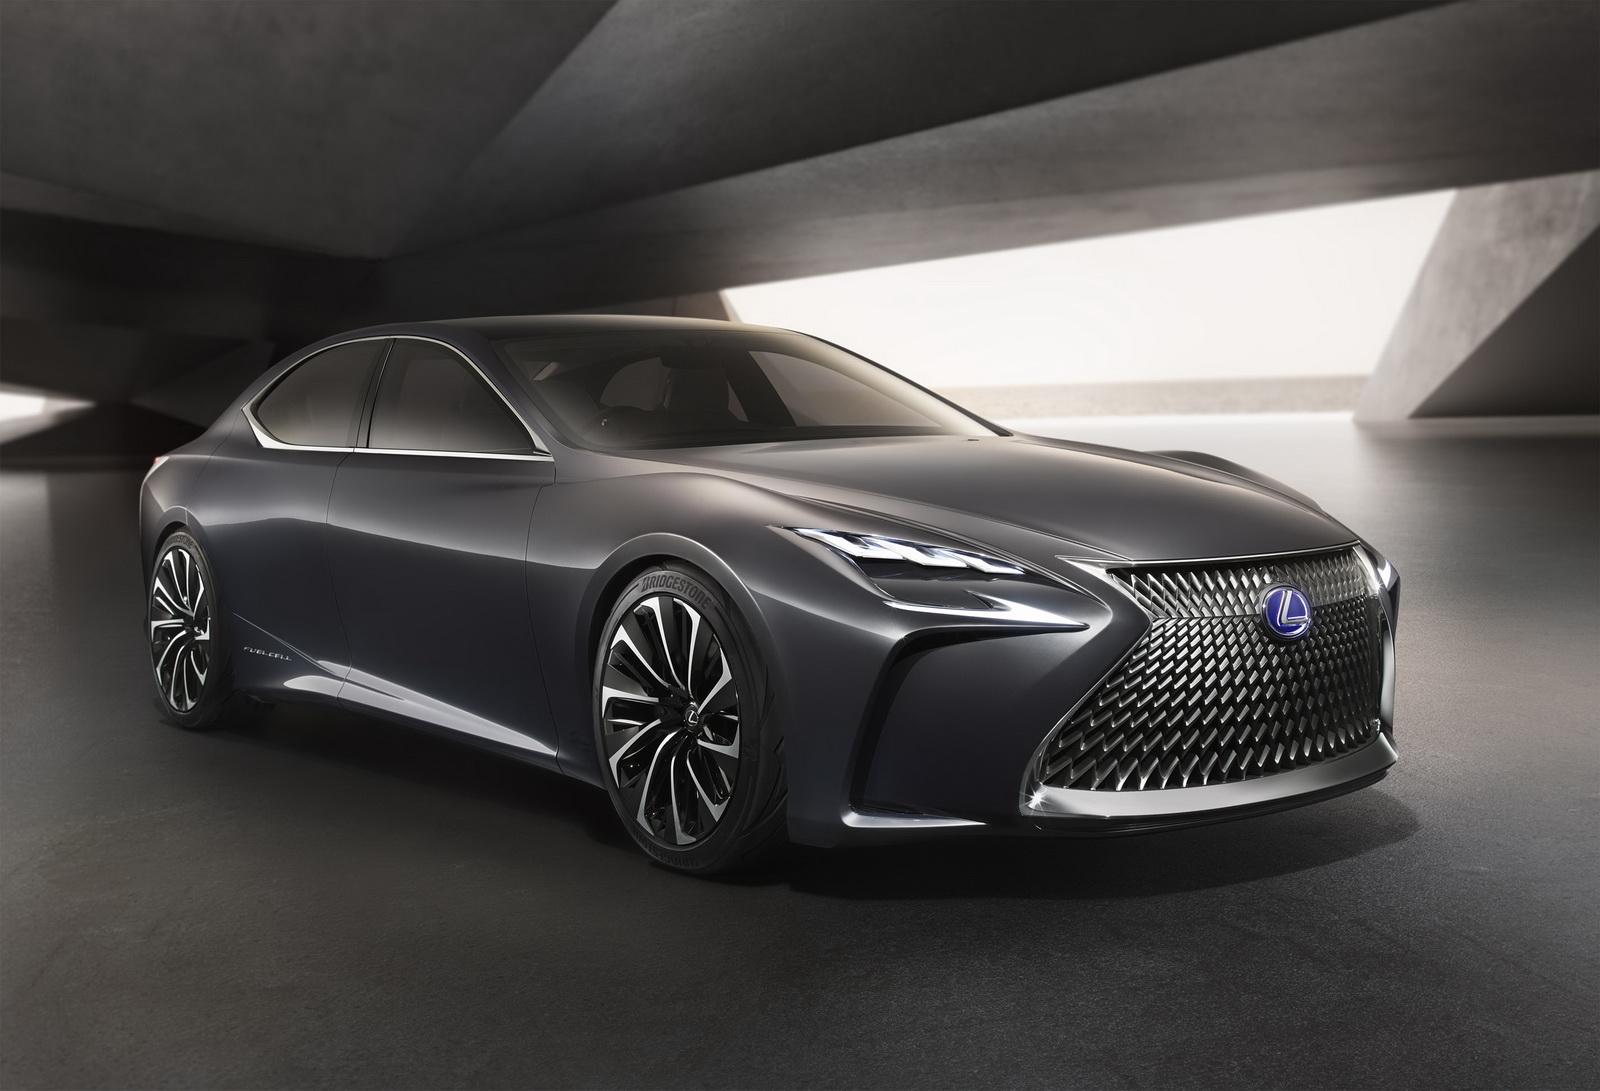 https://storage.googleapis.com/gtspirit/uploads/2015/10/Lexus-LF-FC-Concept-5.jpg